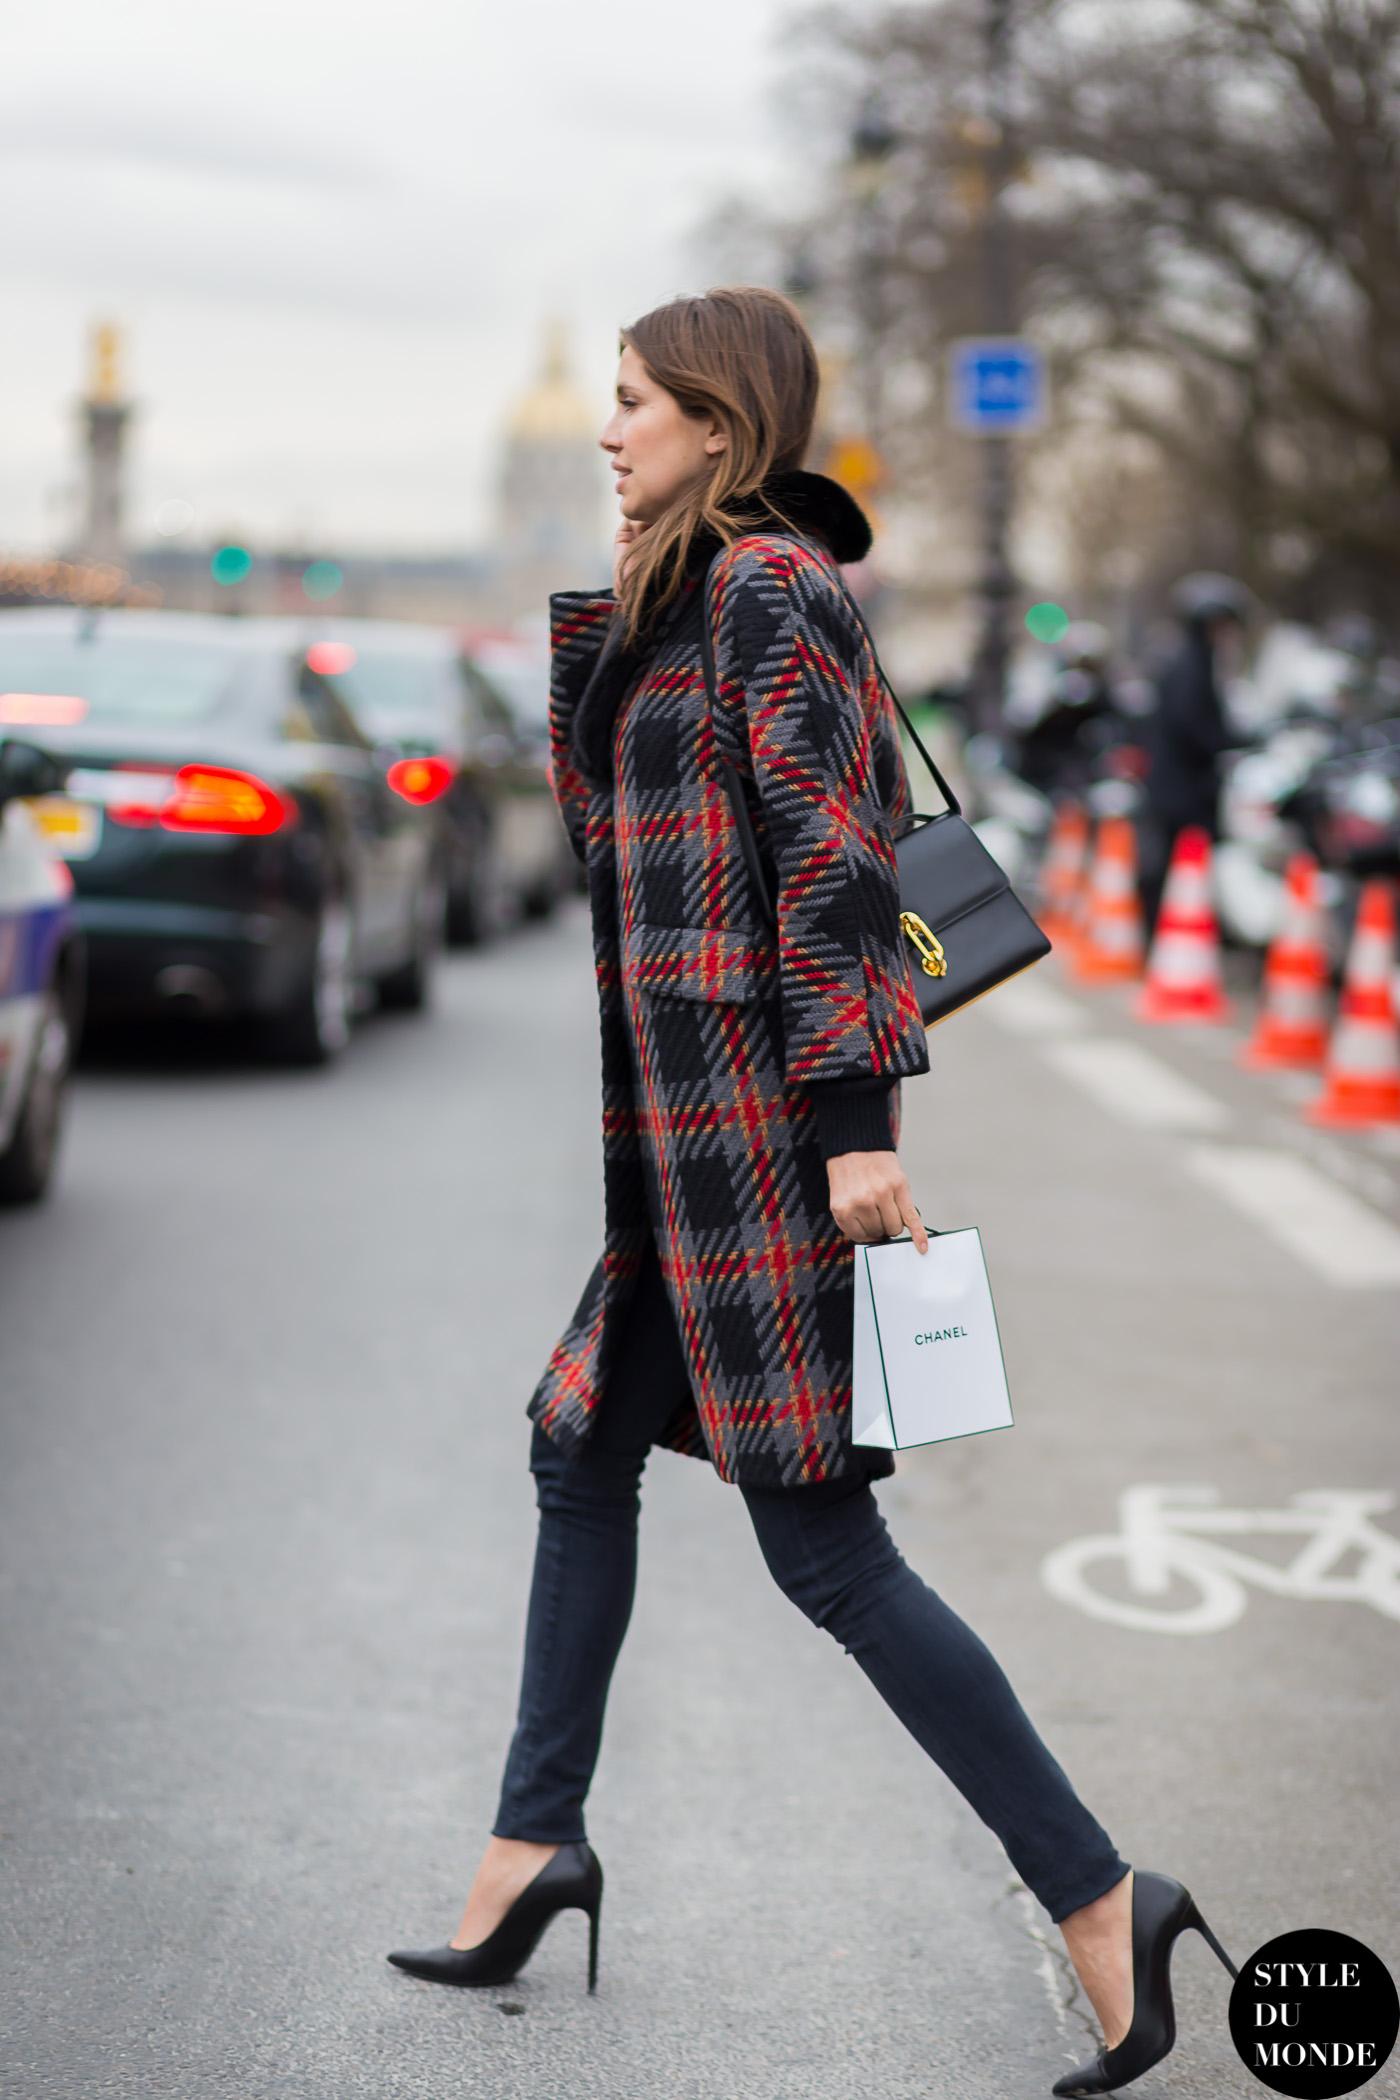 Blackfashion Blog Facebook Puksies Wardrobe Tumblr: Haute Couture SS 2015 Street Style: Dasha Zhukova